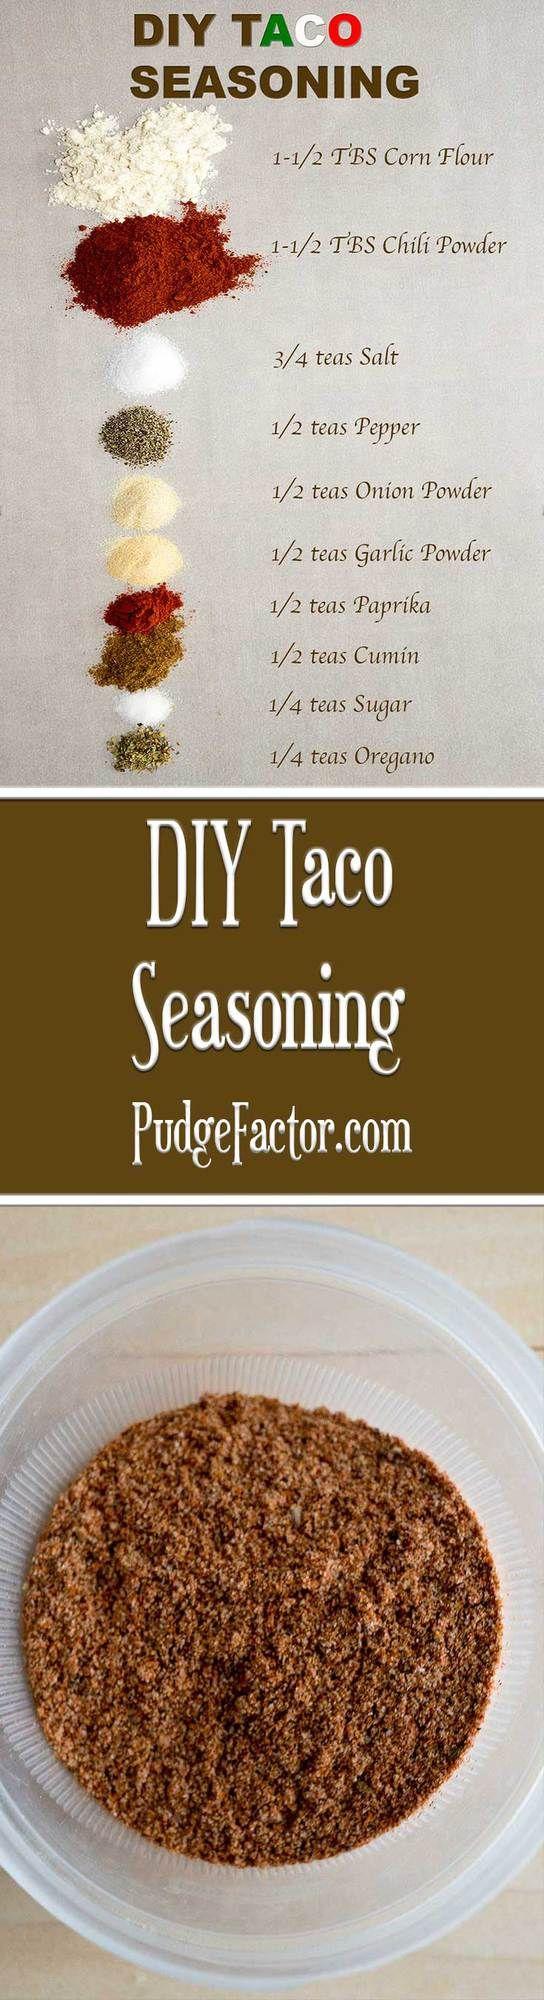 DIY Taco Seasoning Mix #tacoseasoningpacket